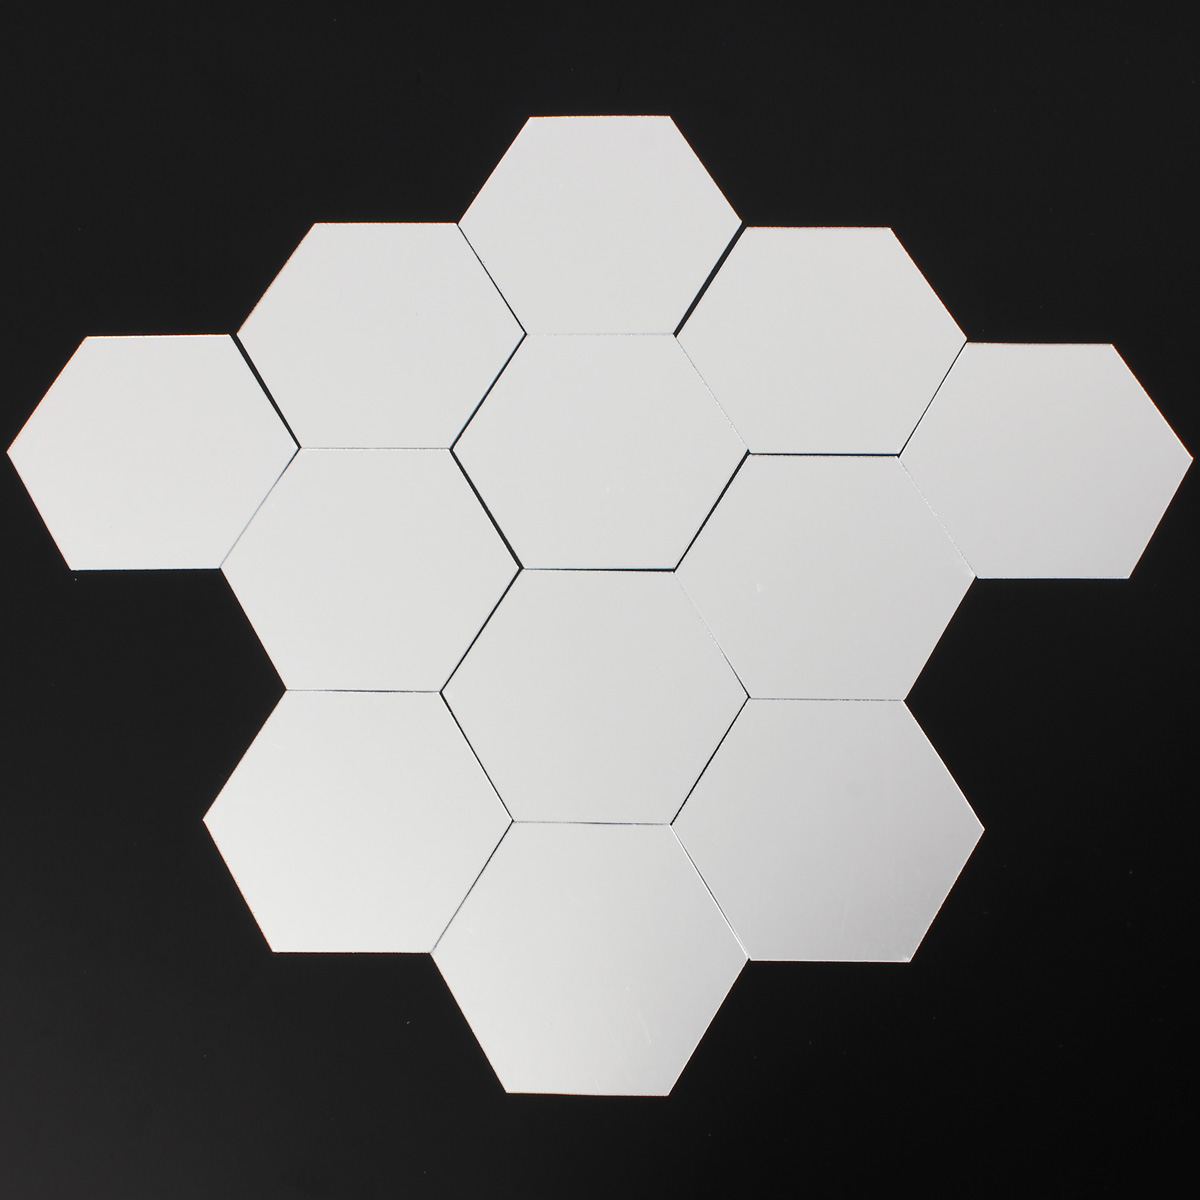 12PCS 3D MIRROR EFFECT GEOMETRIC HEXAGON ACRYLIC WALL ...